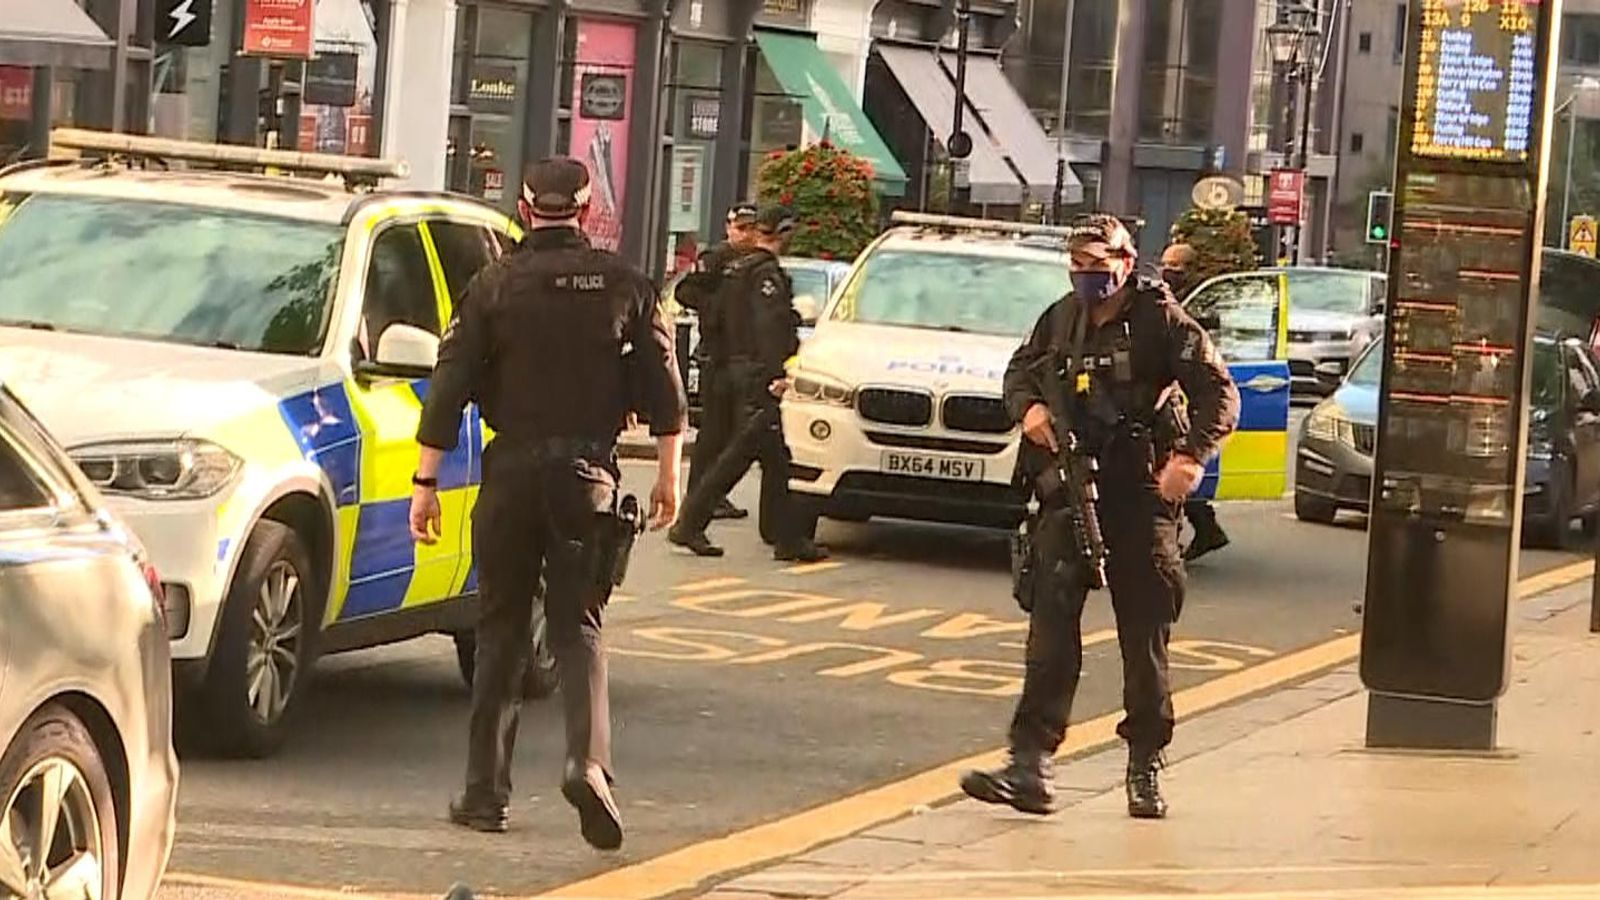 Multiple stabbings in Birmingham, UK - police declare 'major incident'